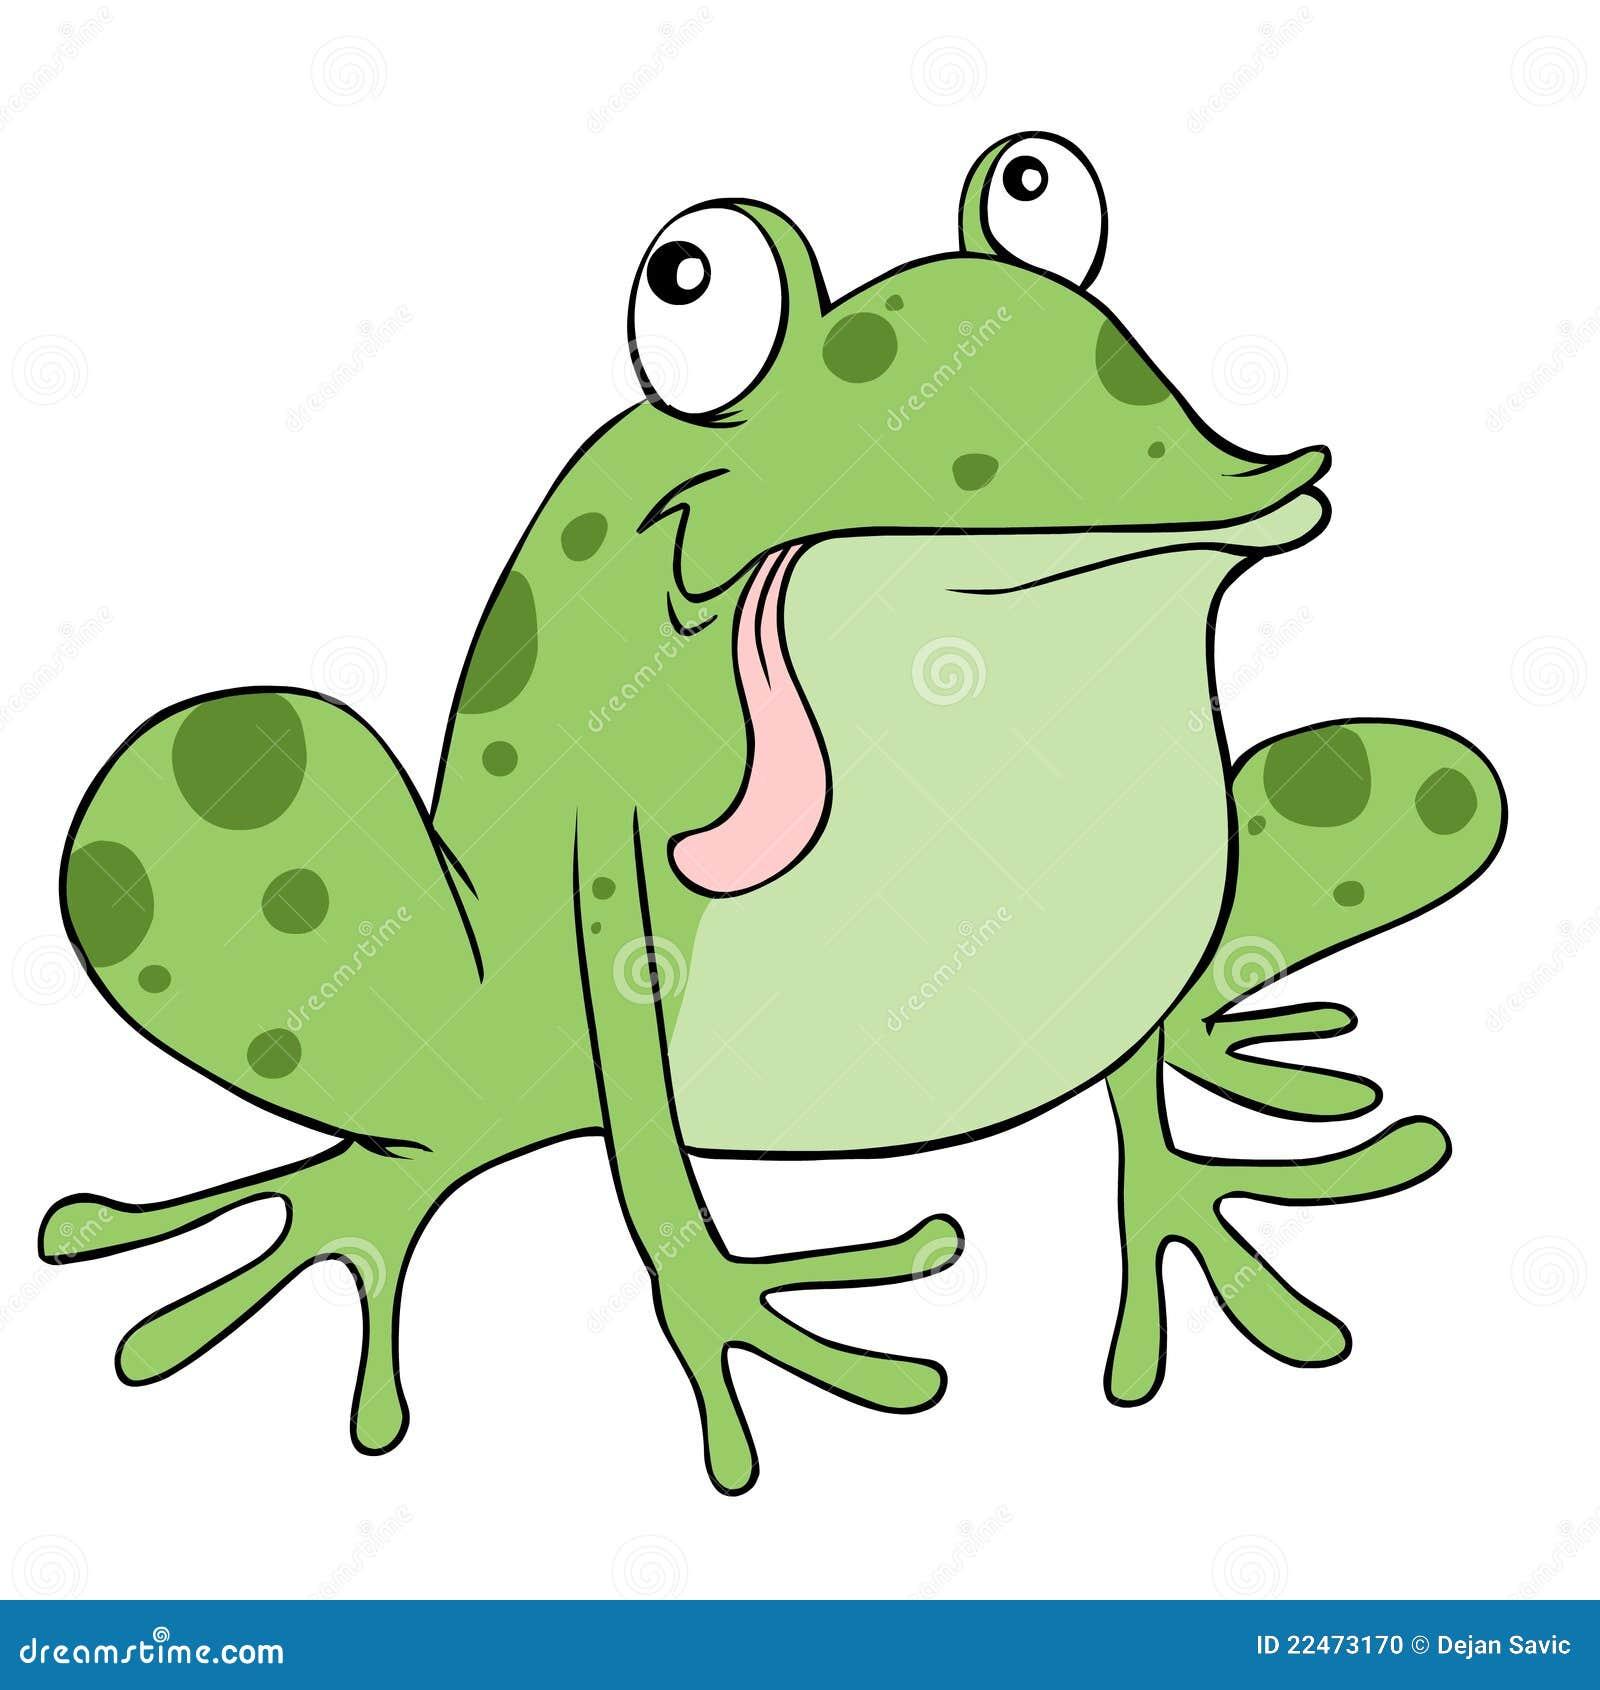 Frog Cartoon Stock Illustration Illustration Of Drawing